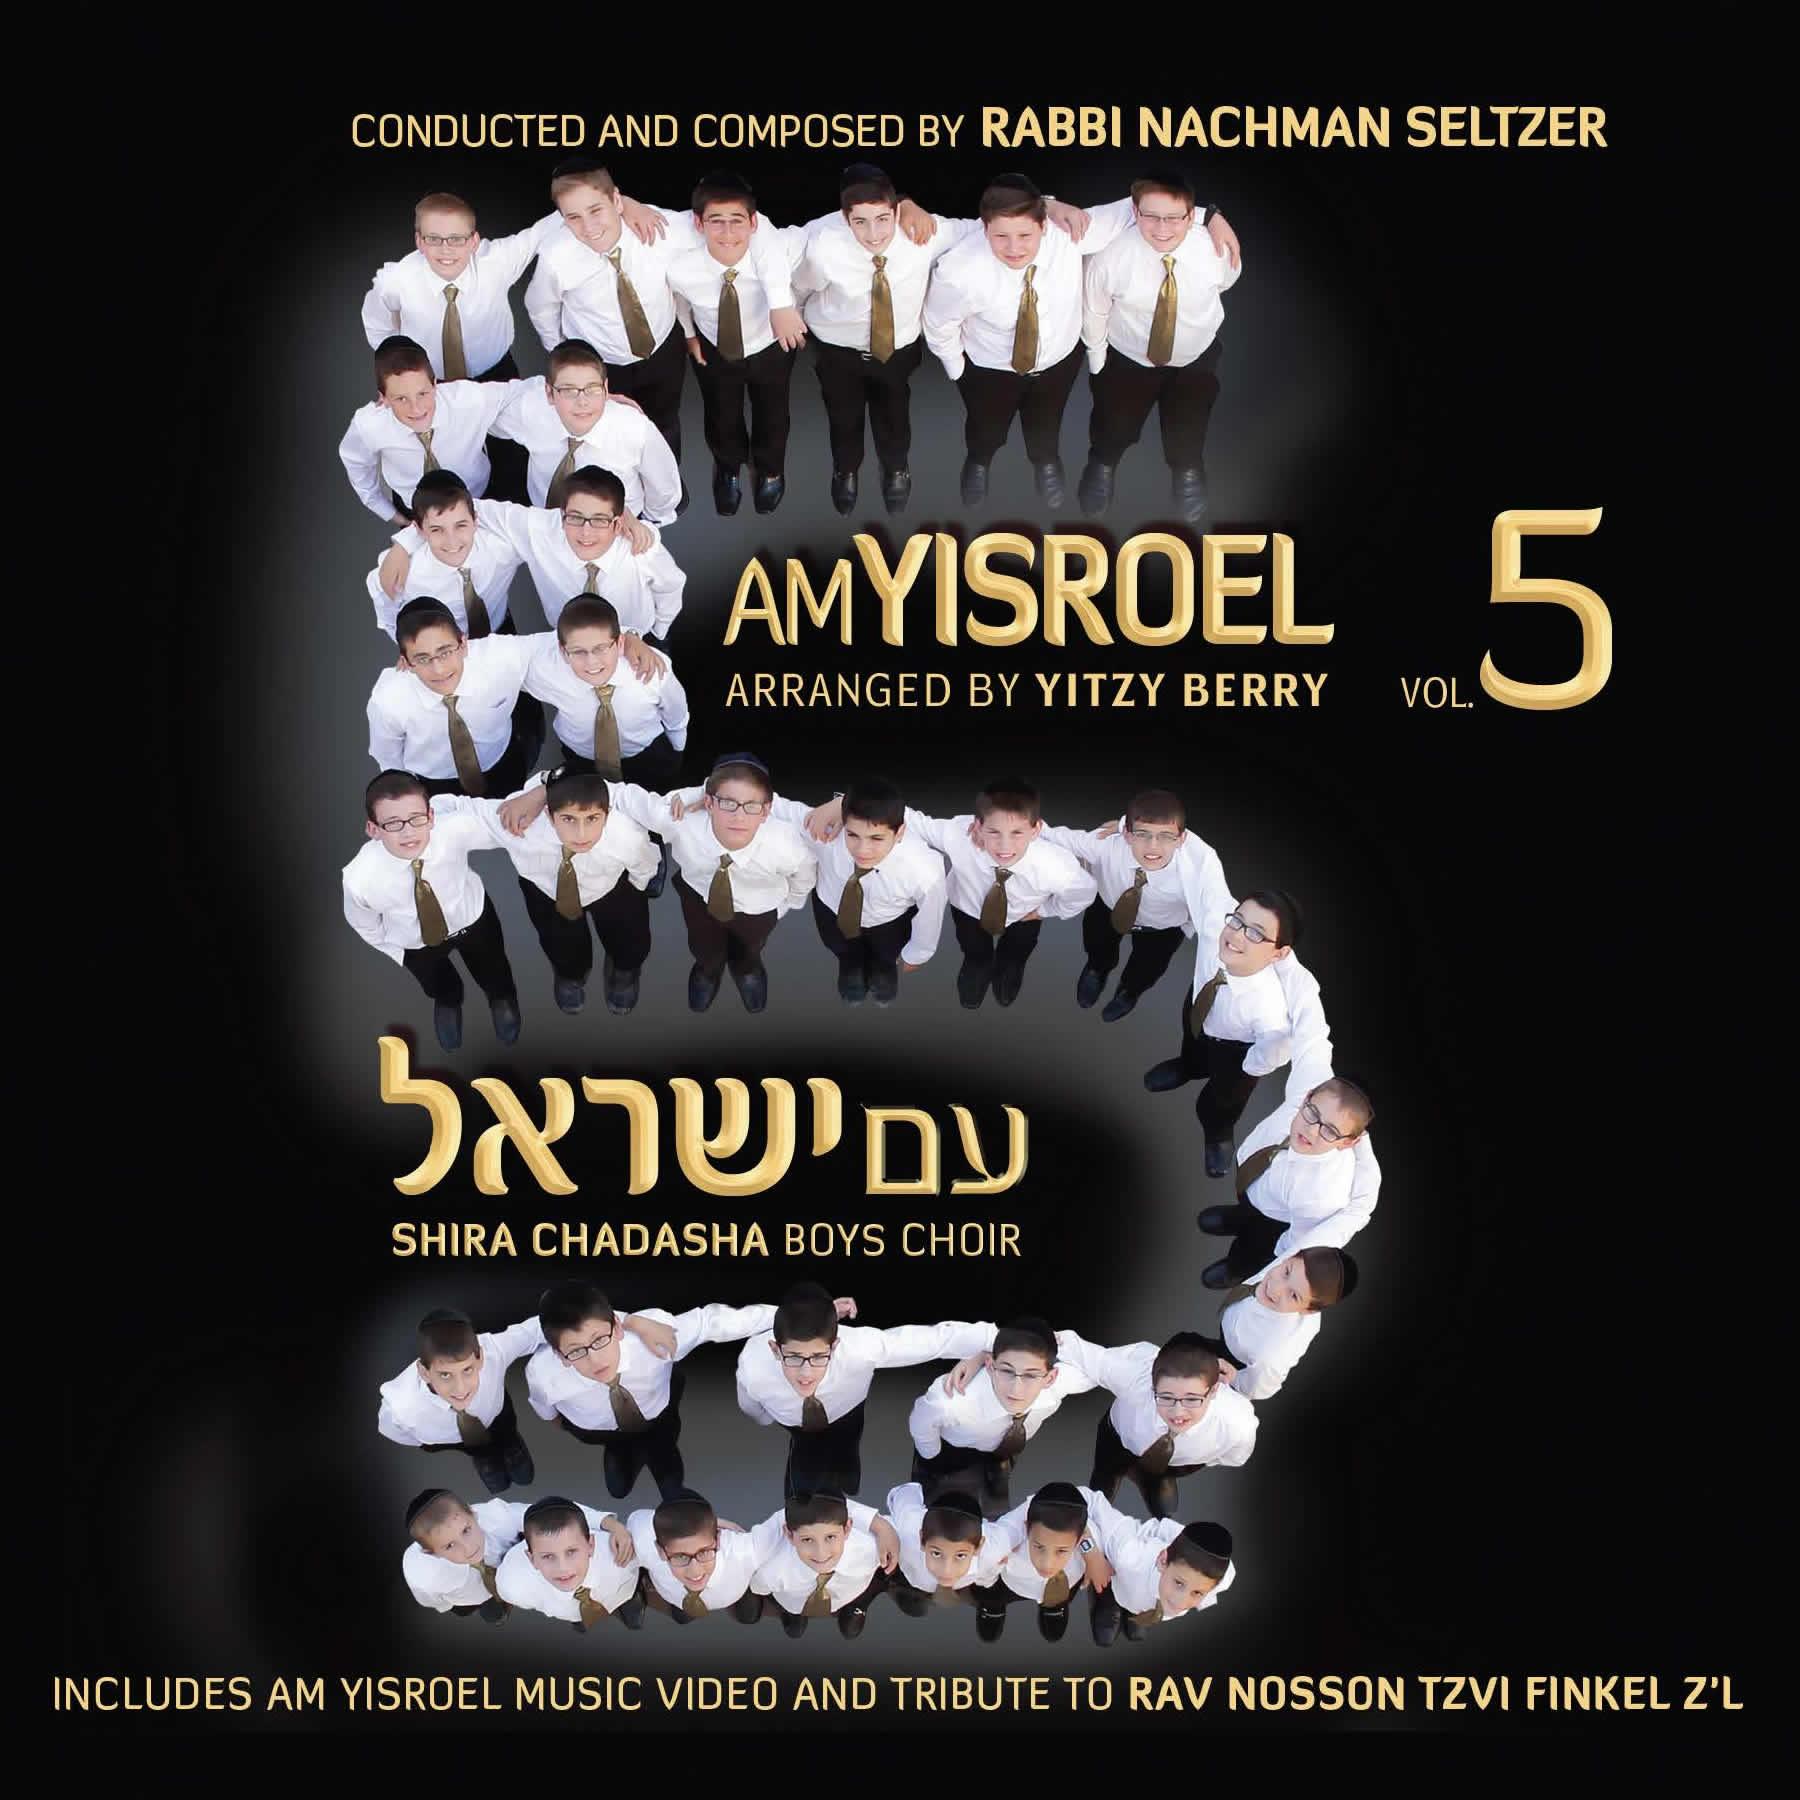 Am Yisroel